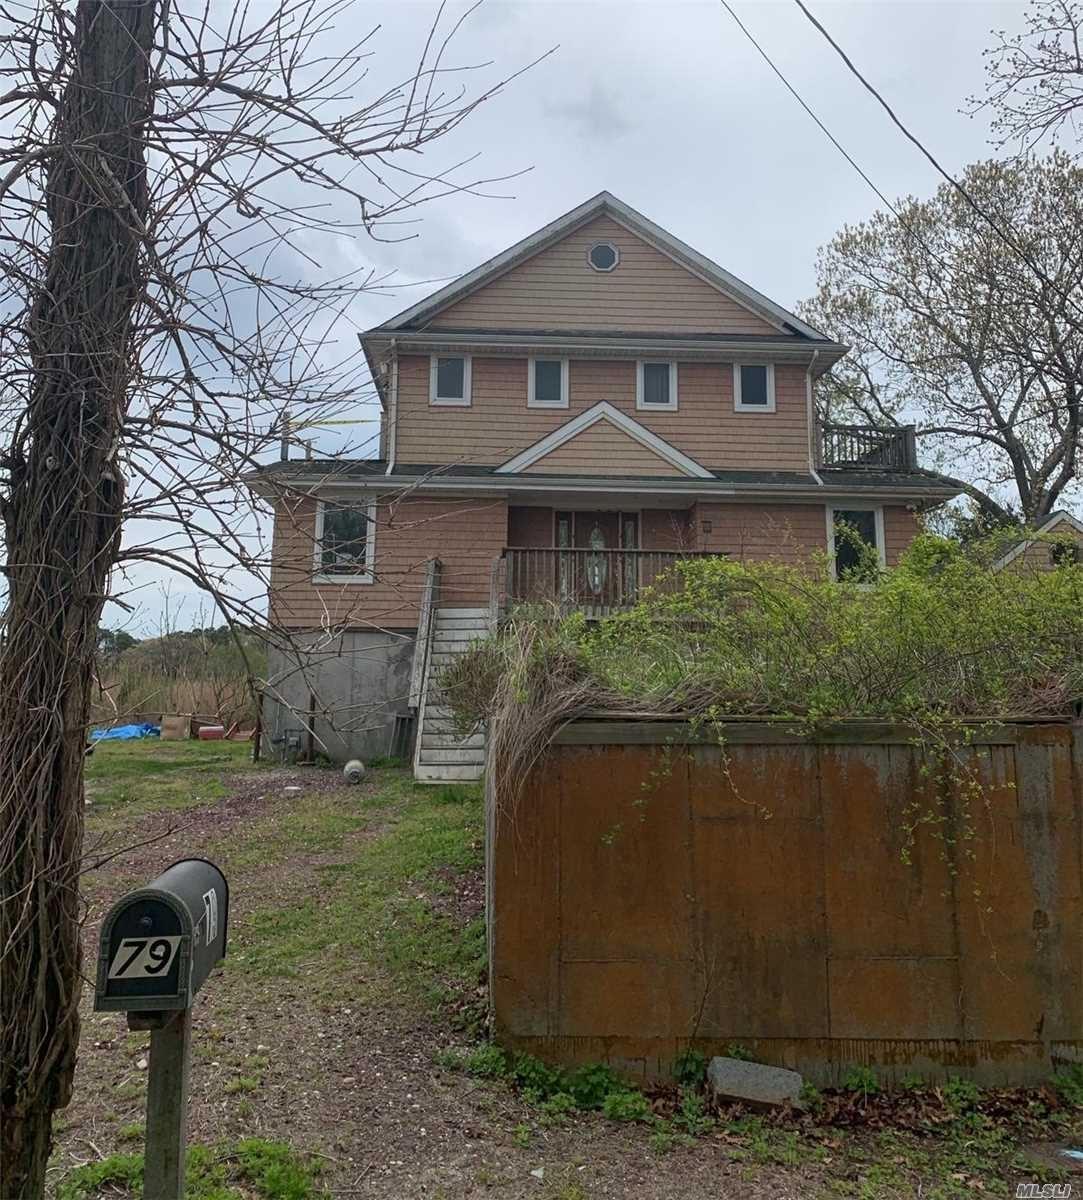 79 Point Rd, Flanders, NY 11901 - MLS#: 3218585